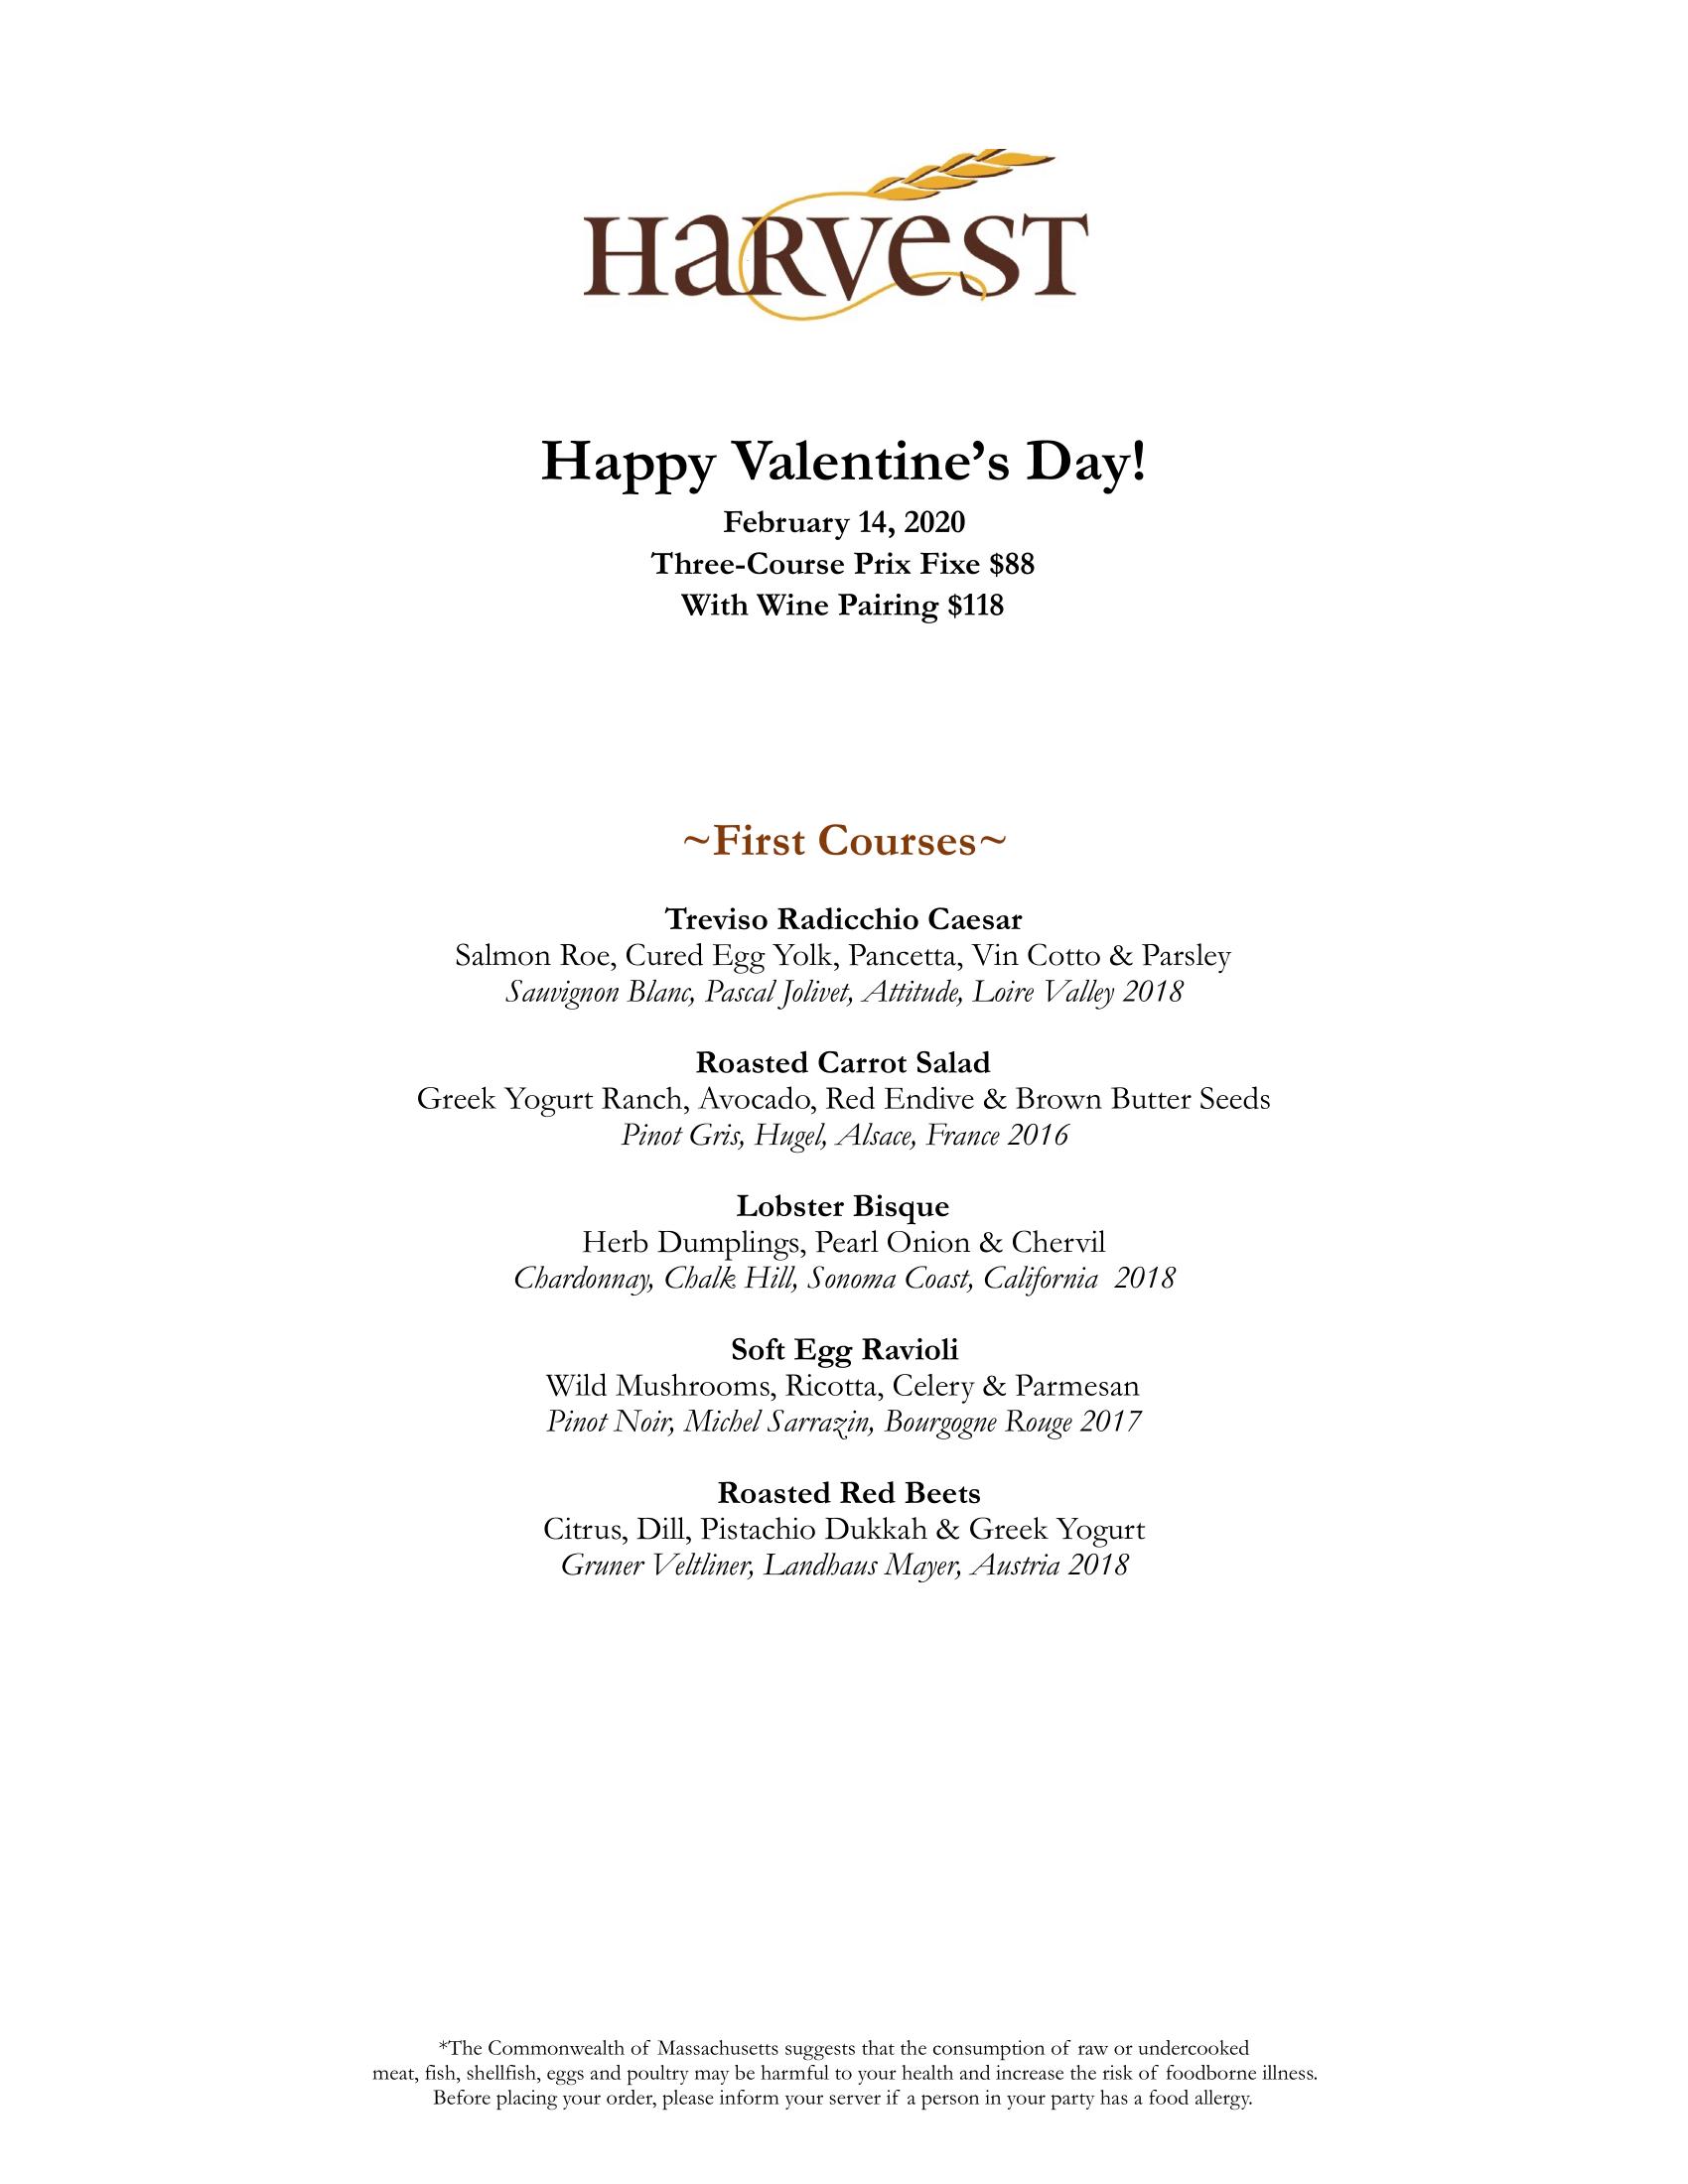 Harvest Valentine's 2020